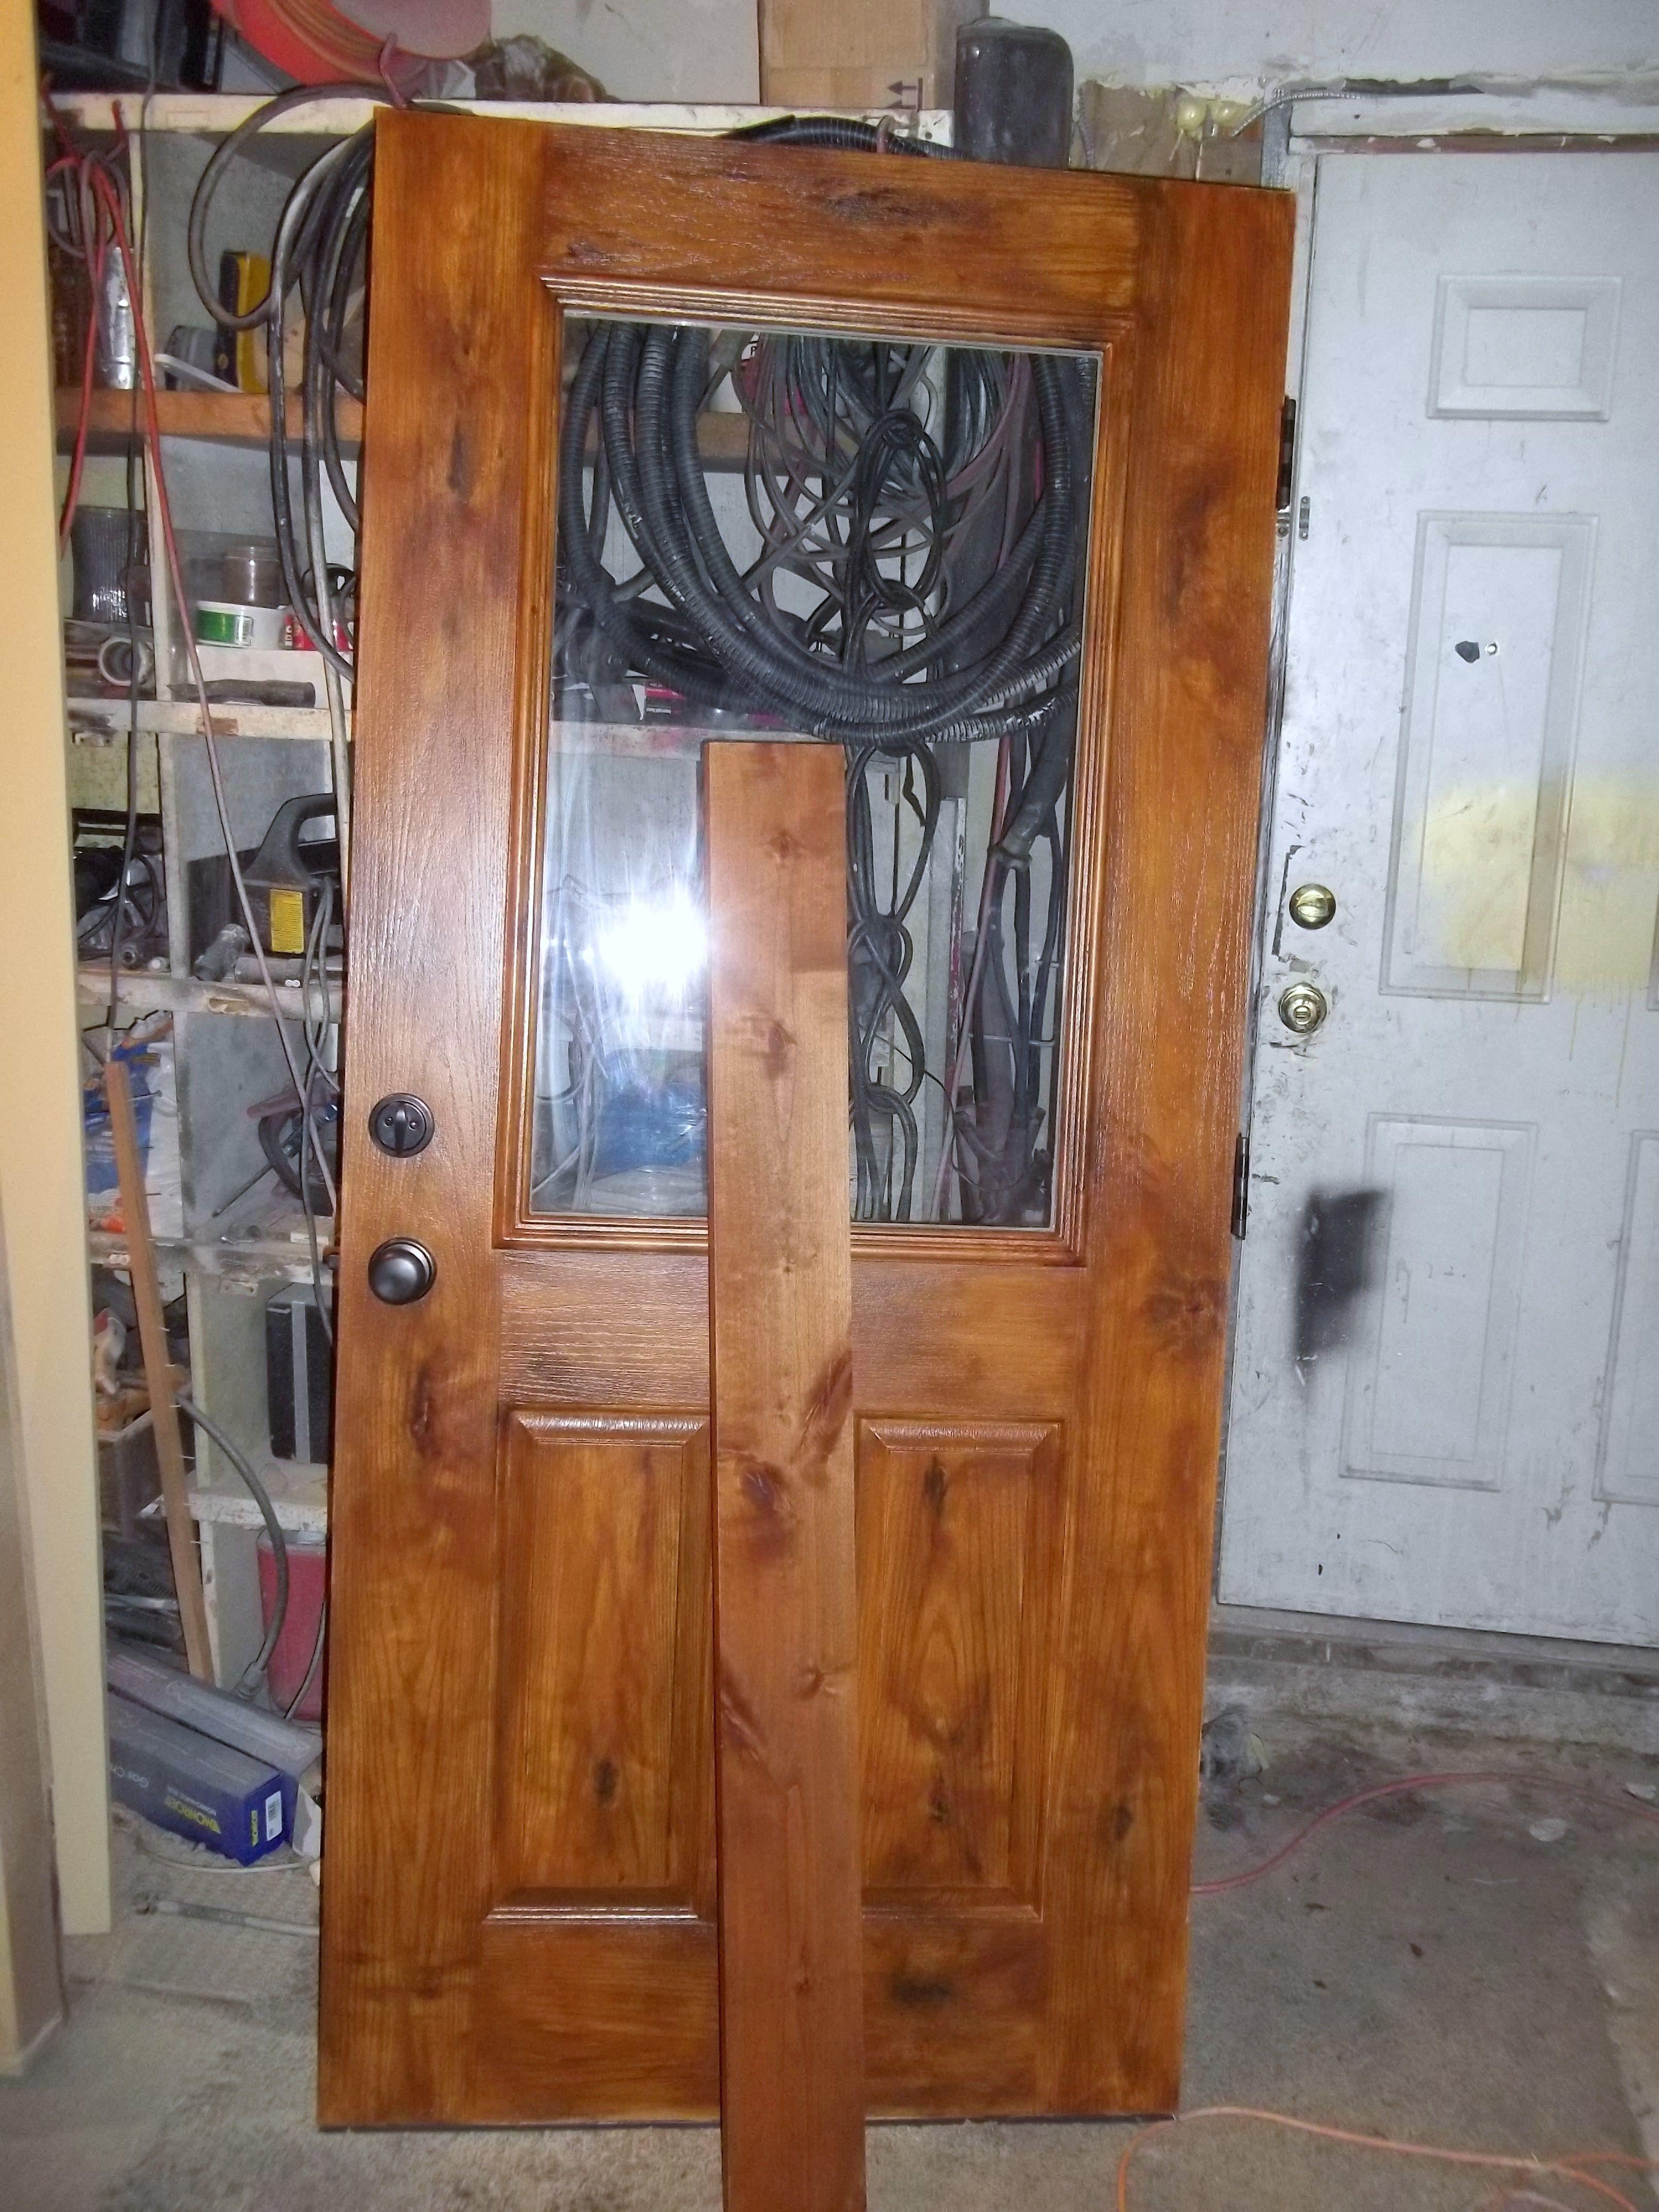 Fiberglass door painted to look like wood